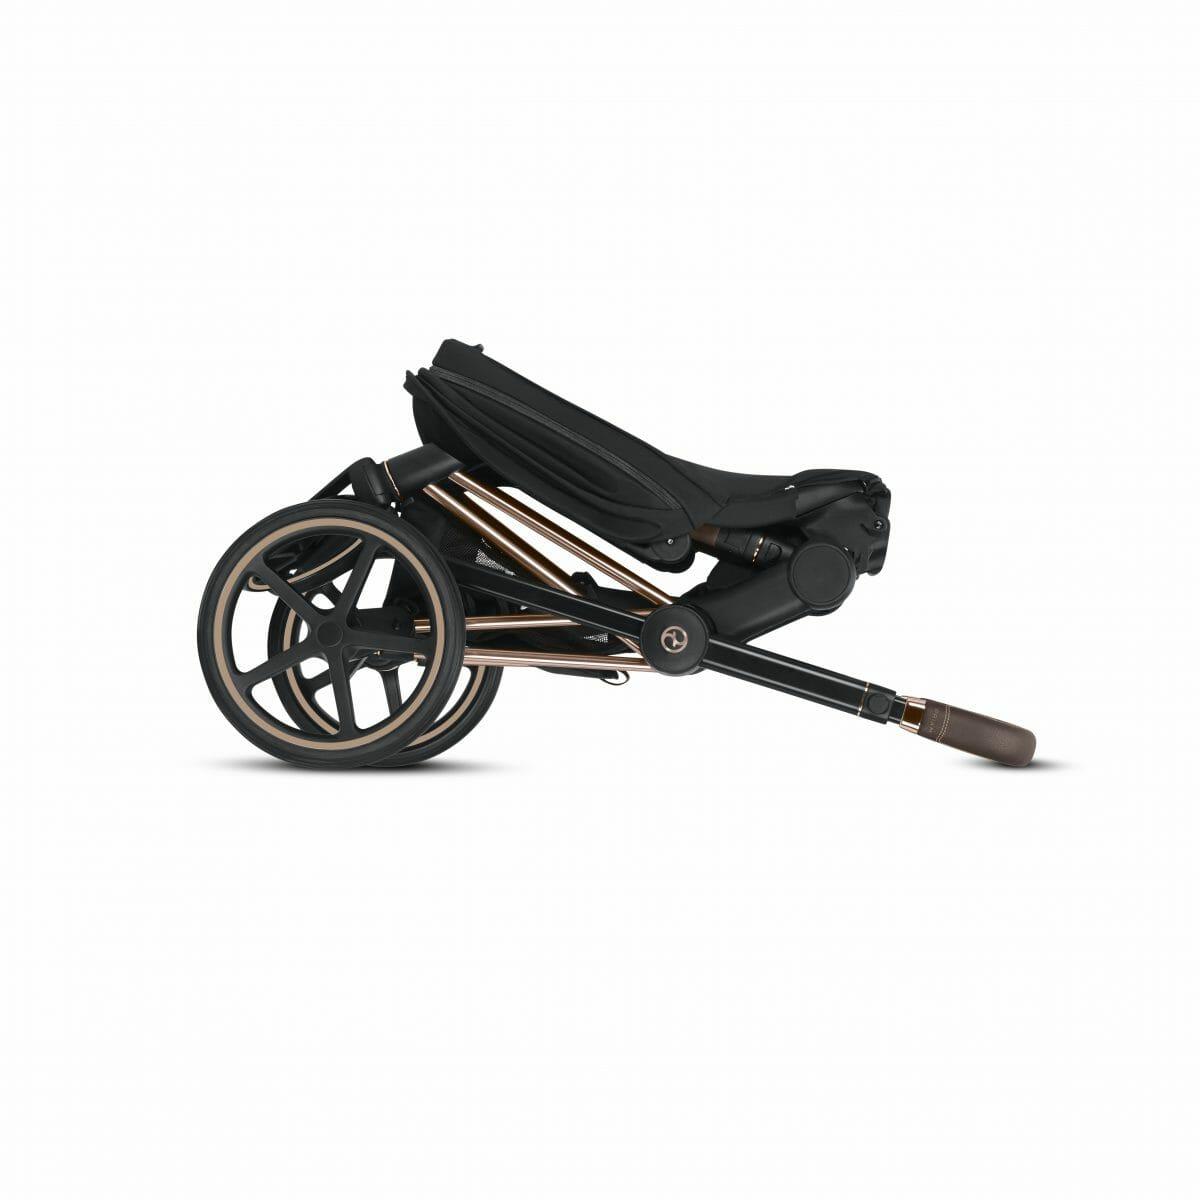 Cybex Priam Rose Gold Frame Black Seat Full Fold